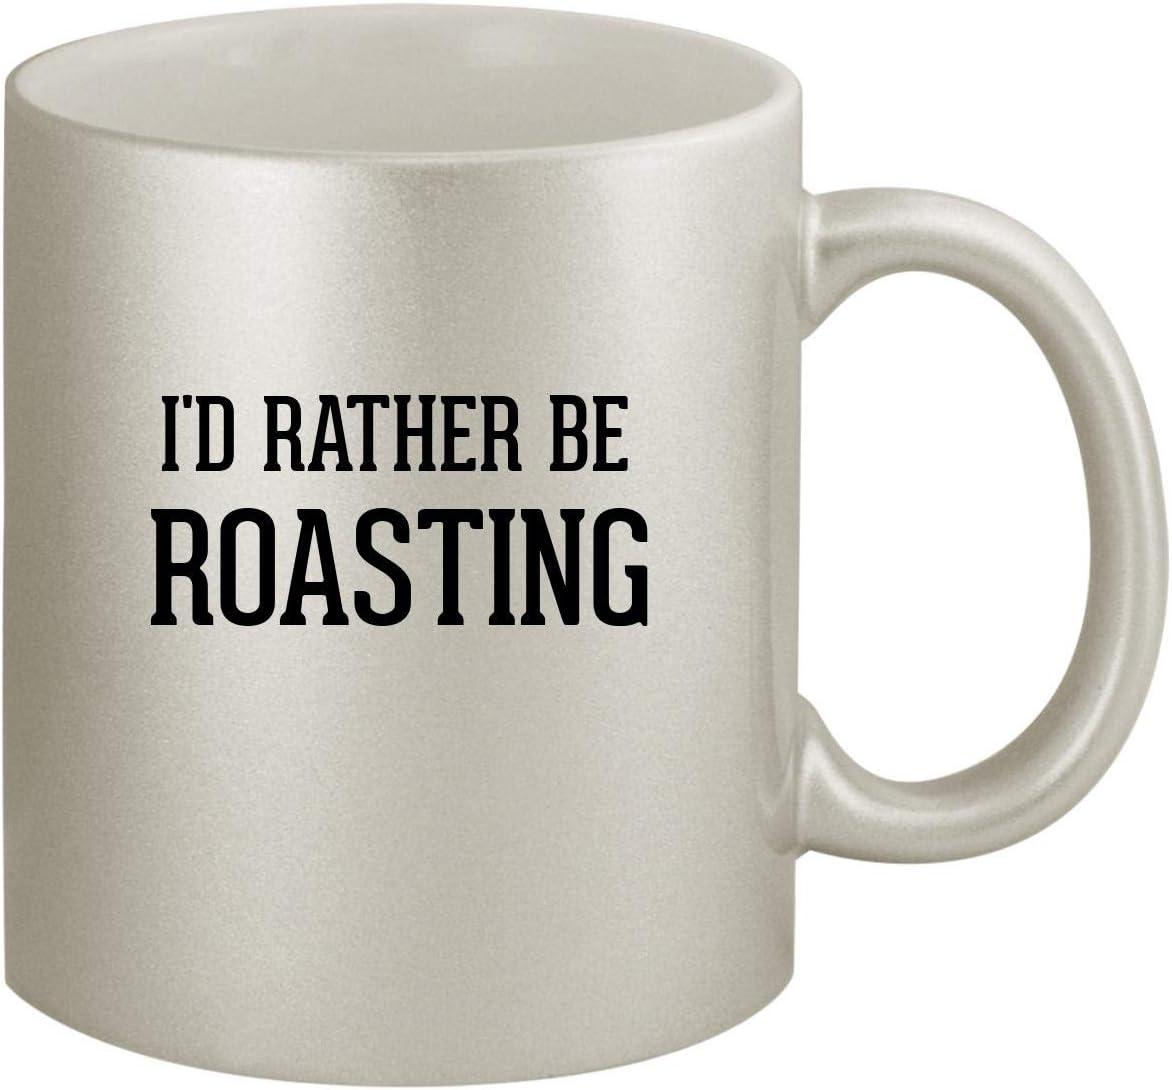 I'd Rather Be ROASTING - Ceramic 11oz Silver Coffee Mug, Silver